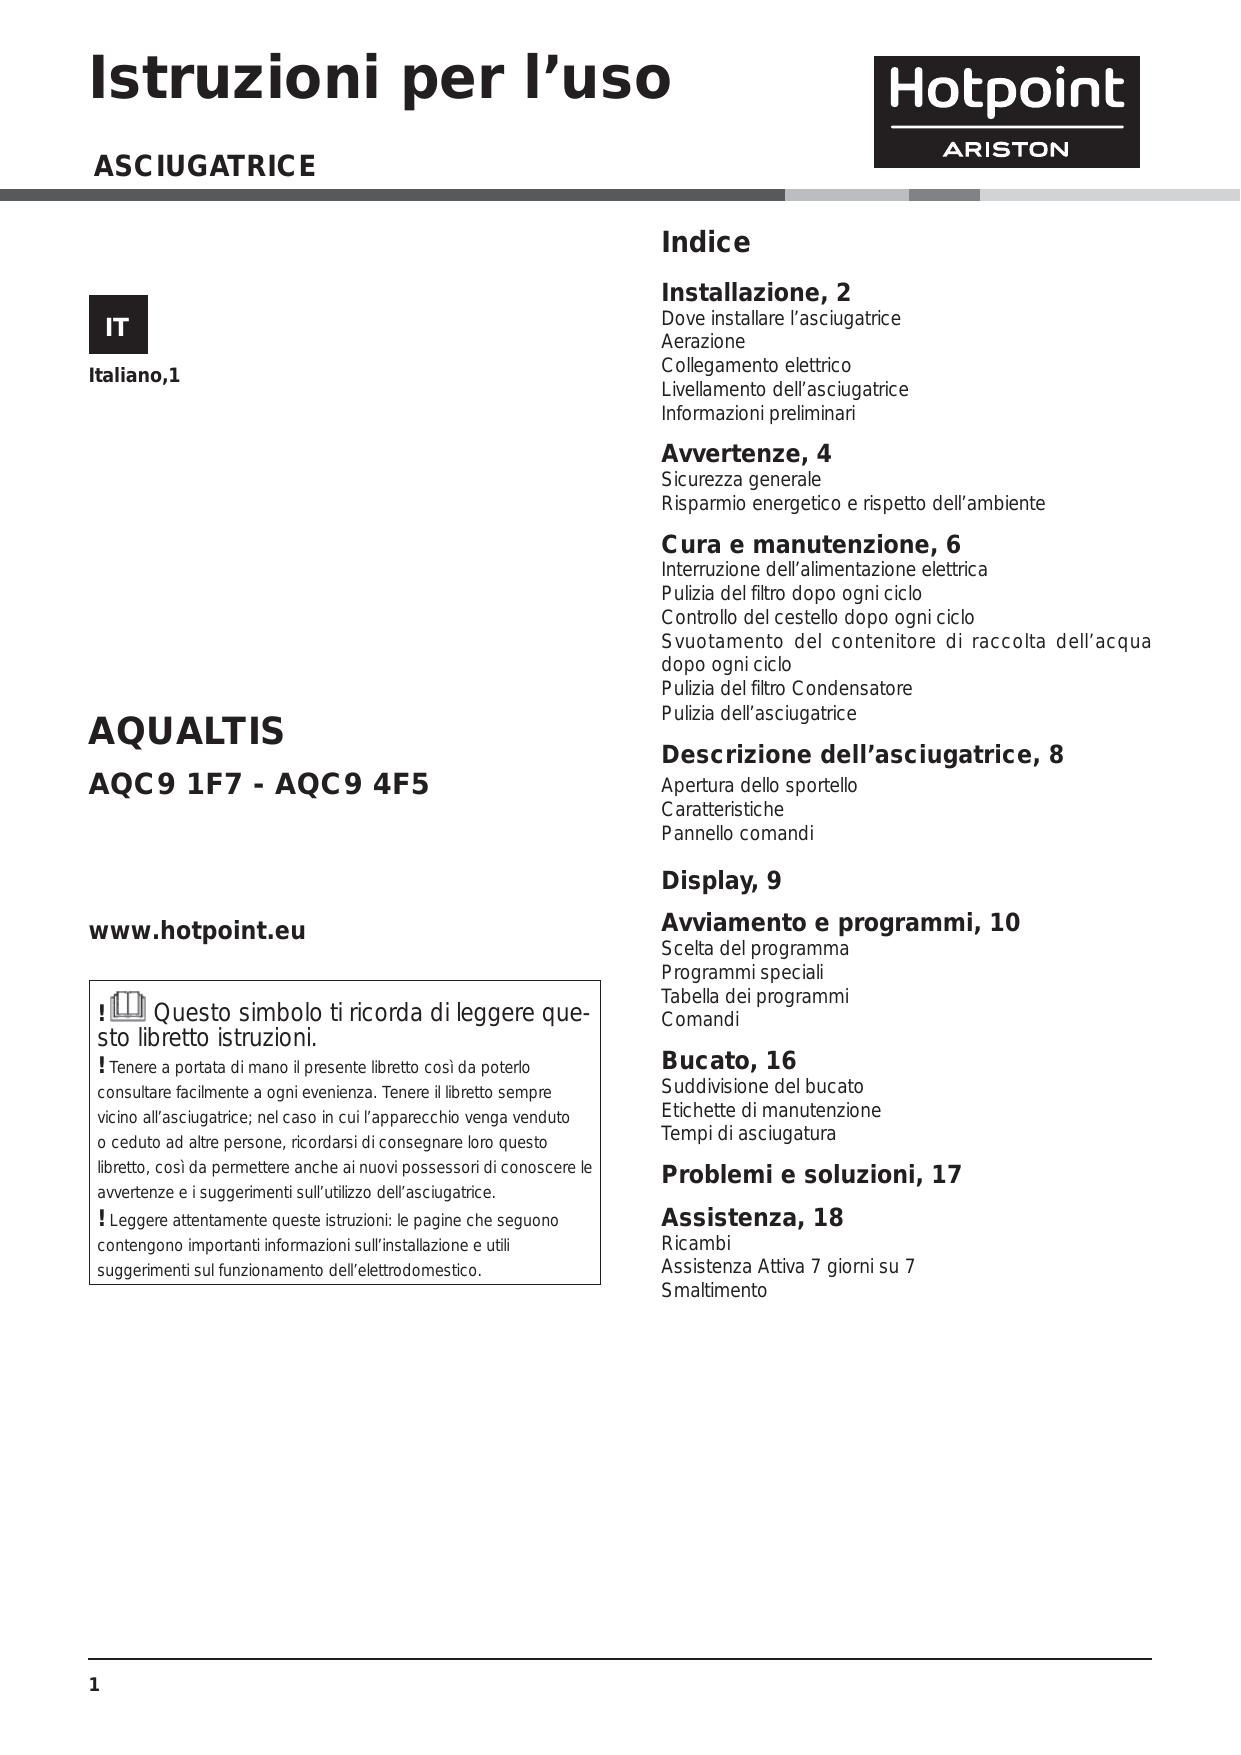 Appendere Asciugatrice Al Muro whirlpool aqc9 4f5 t/z1 (it) instruction for use   manualzz